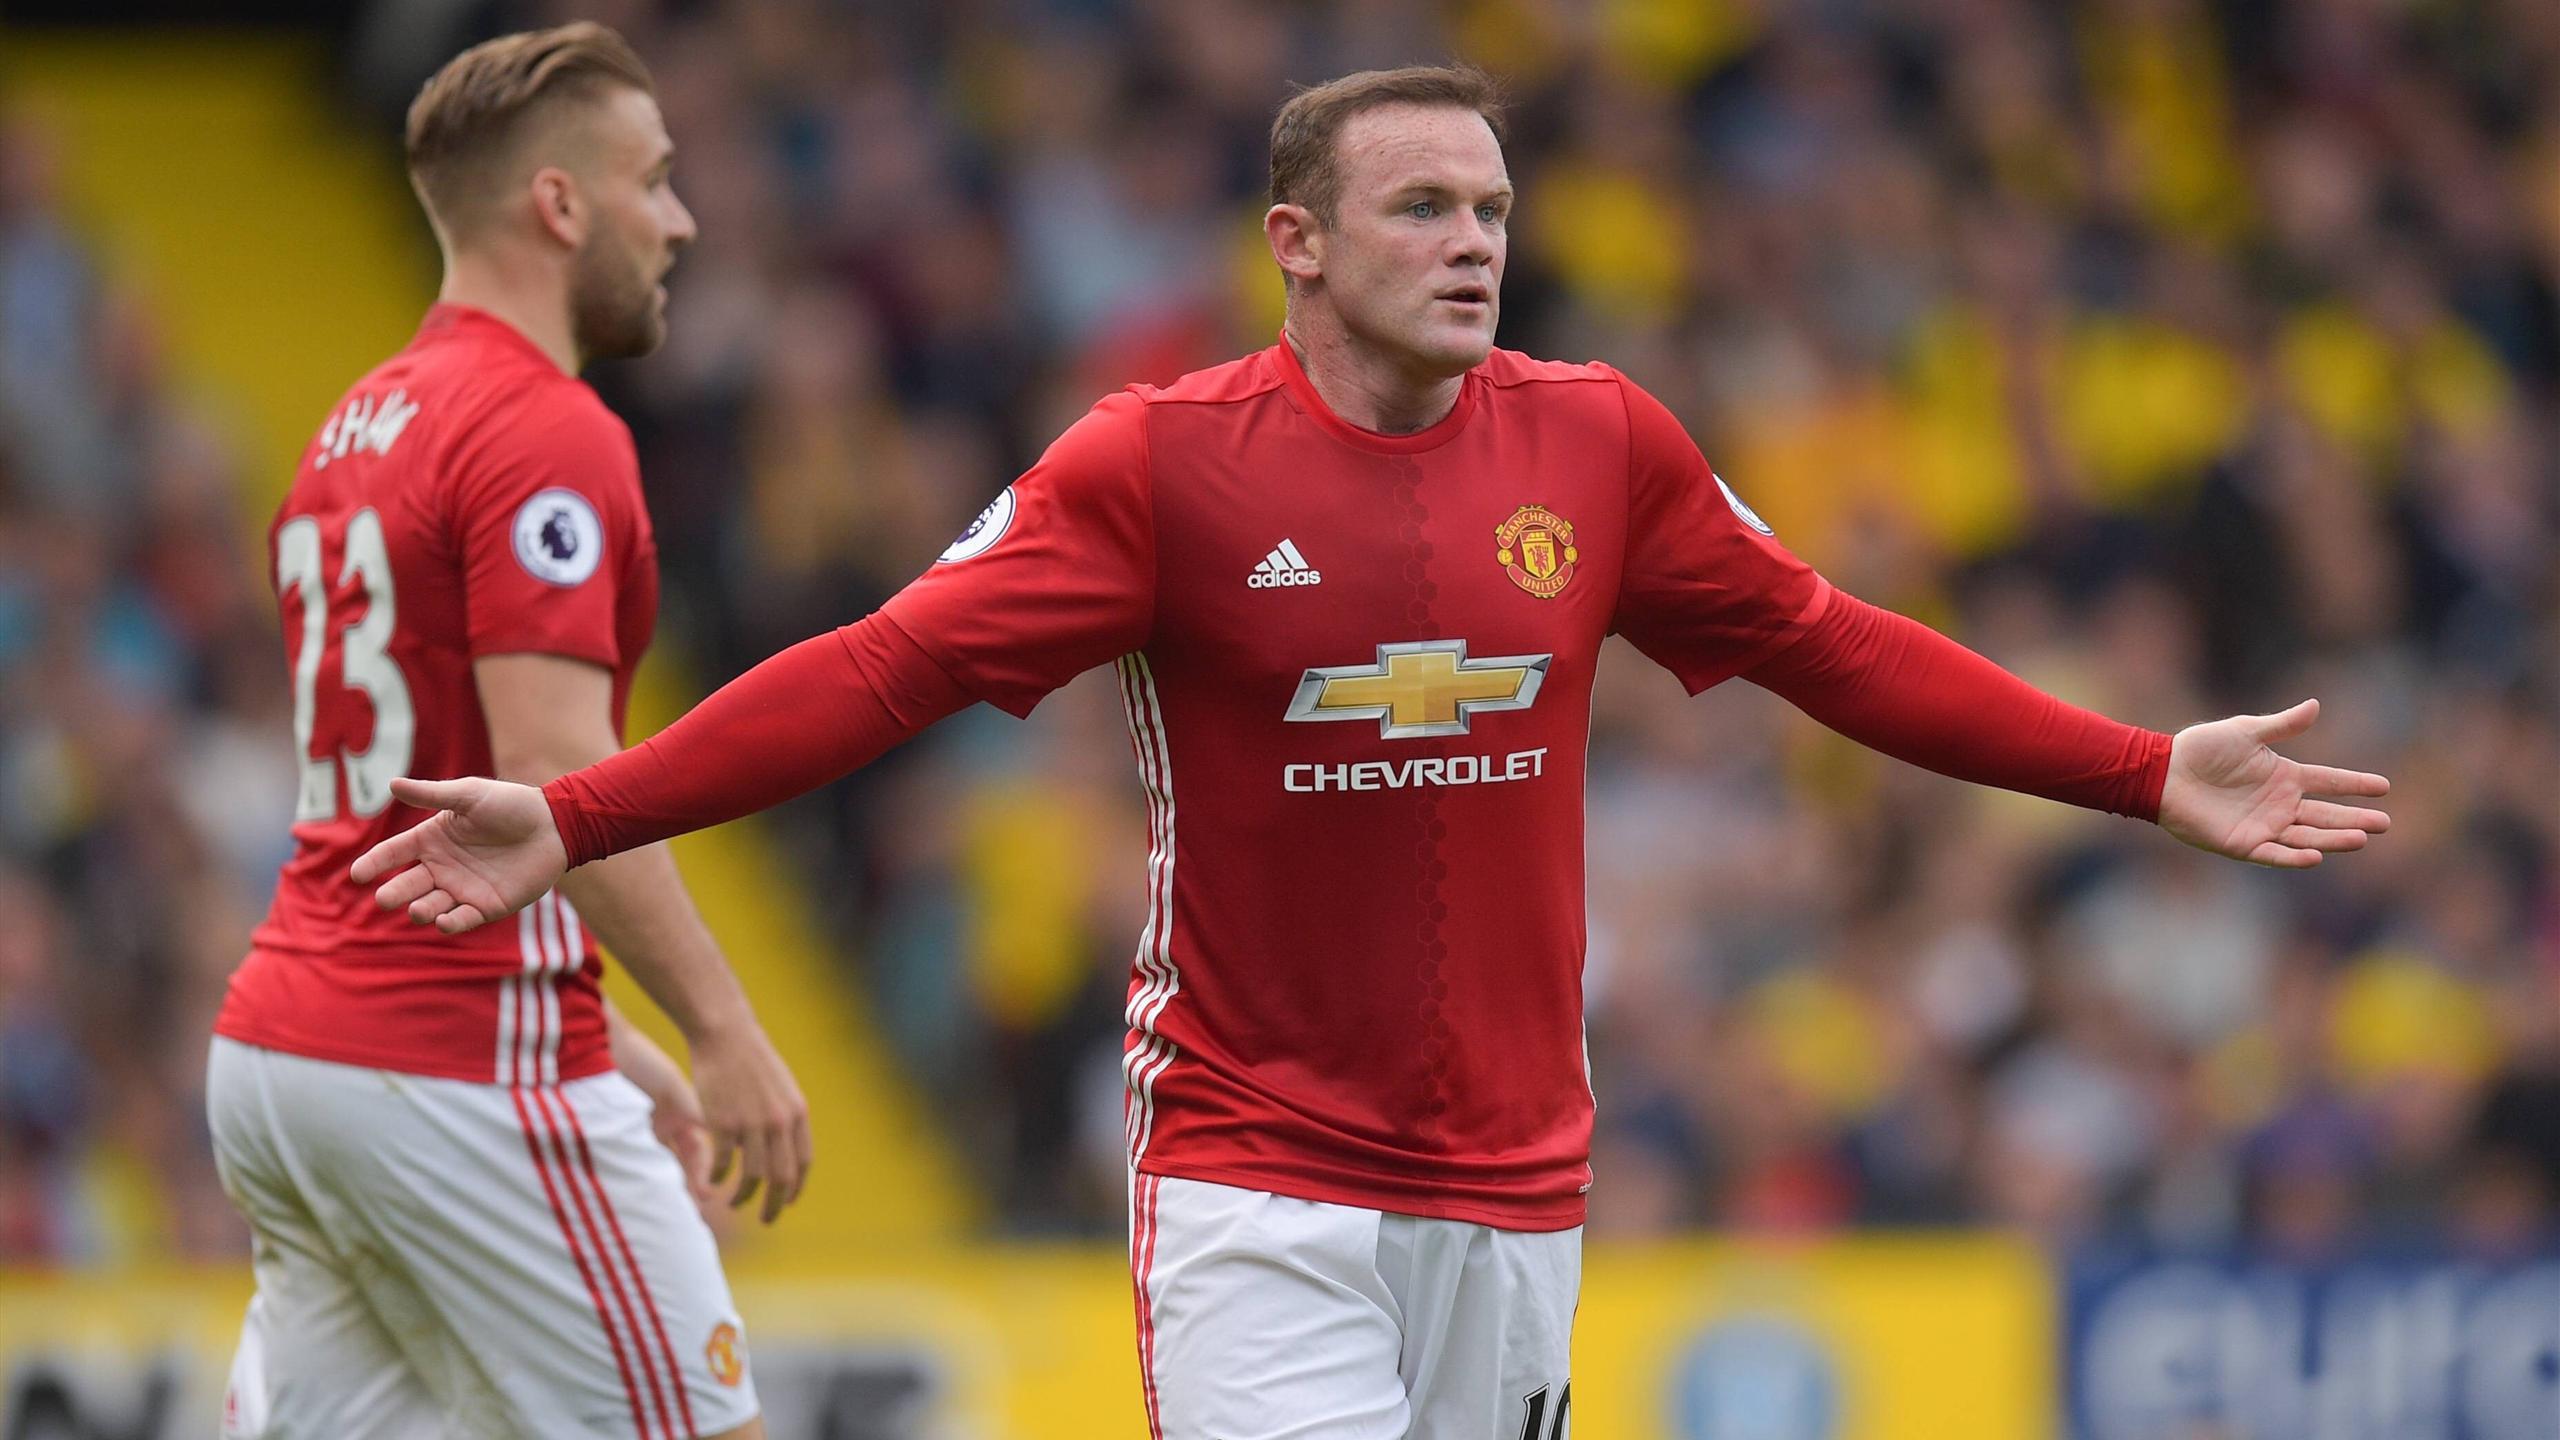 Wayne Rooney had a bad performance against Watford